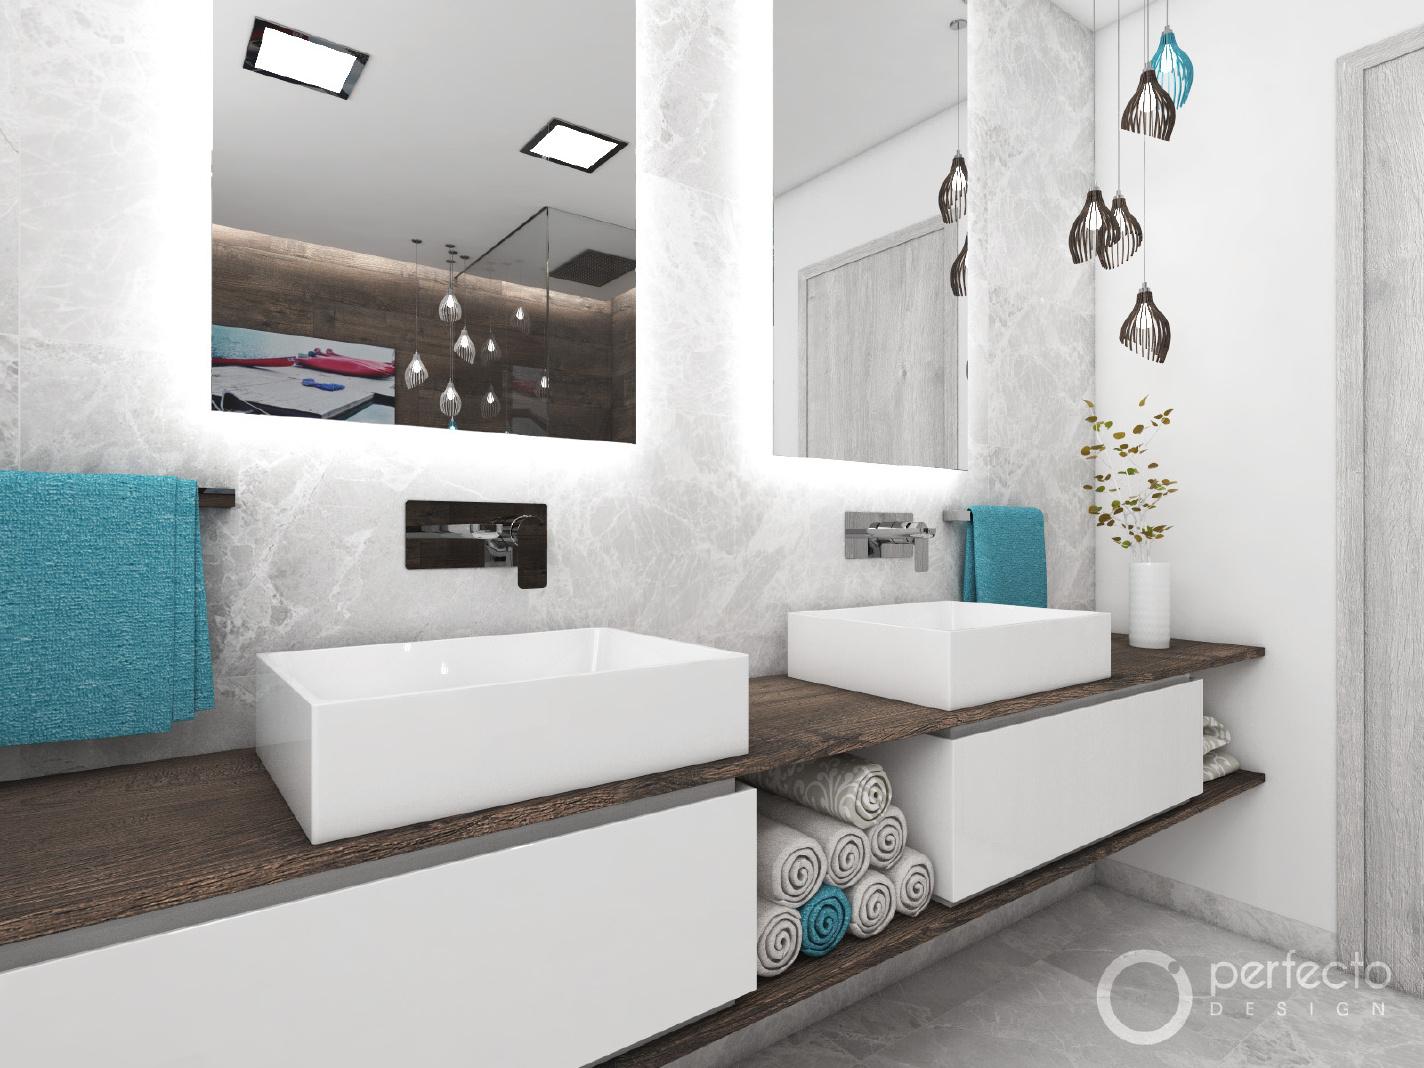 modernes badezimmer river | perfecto design - Modernes Badezimmer